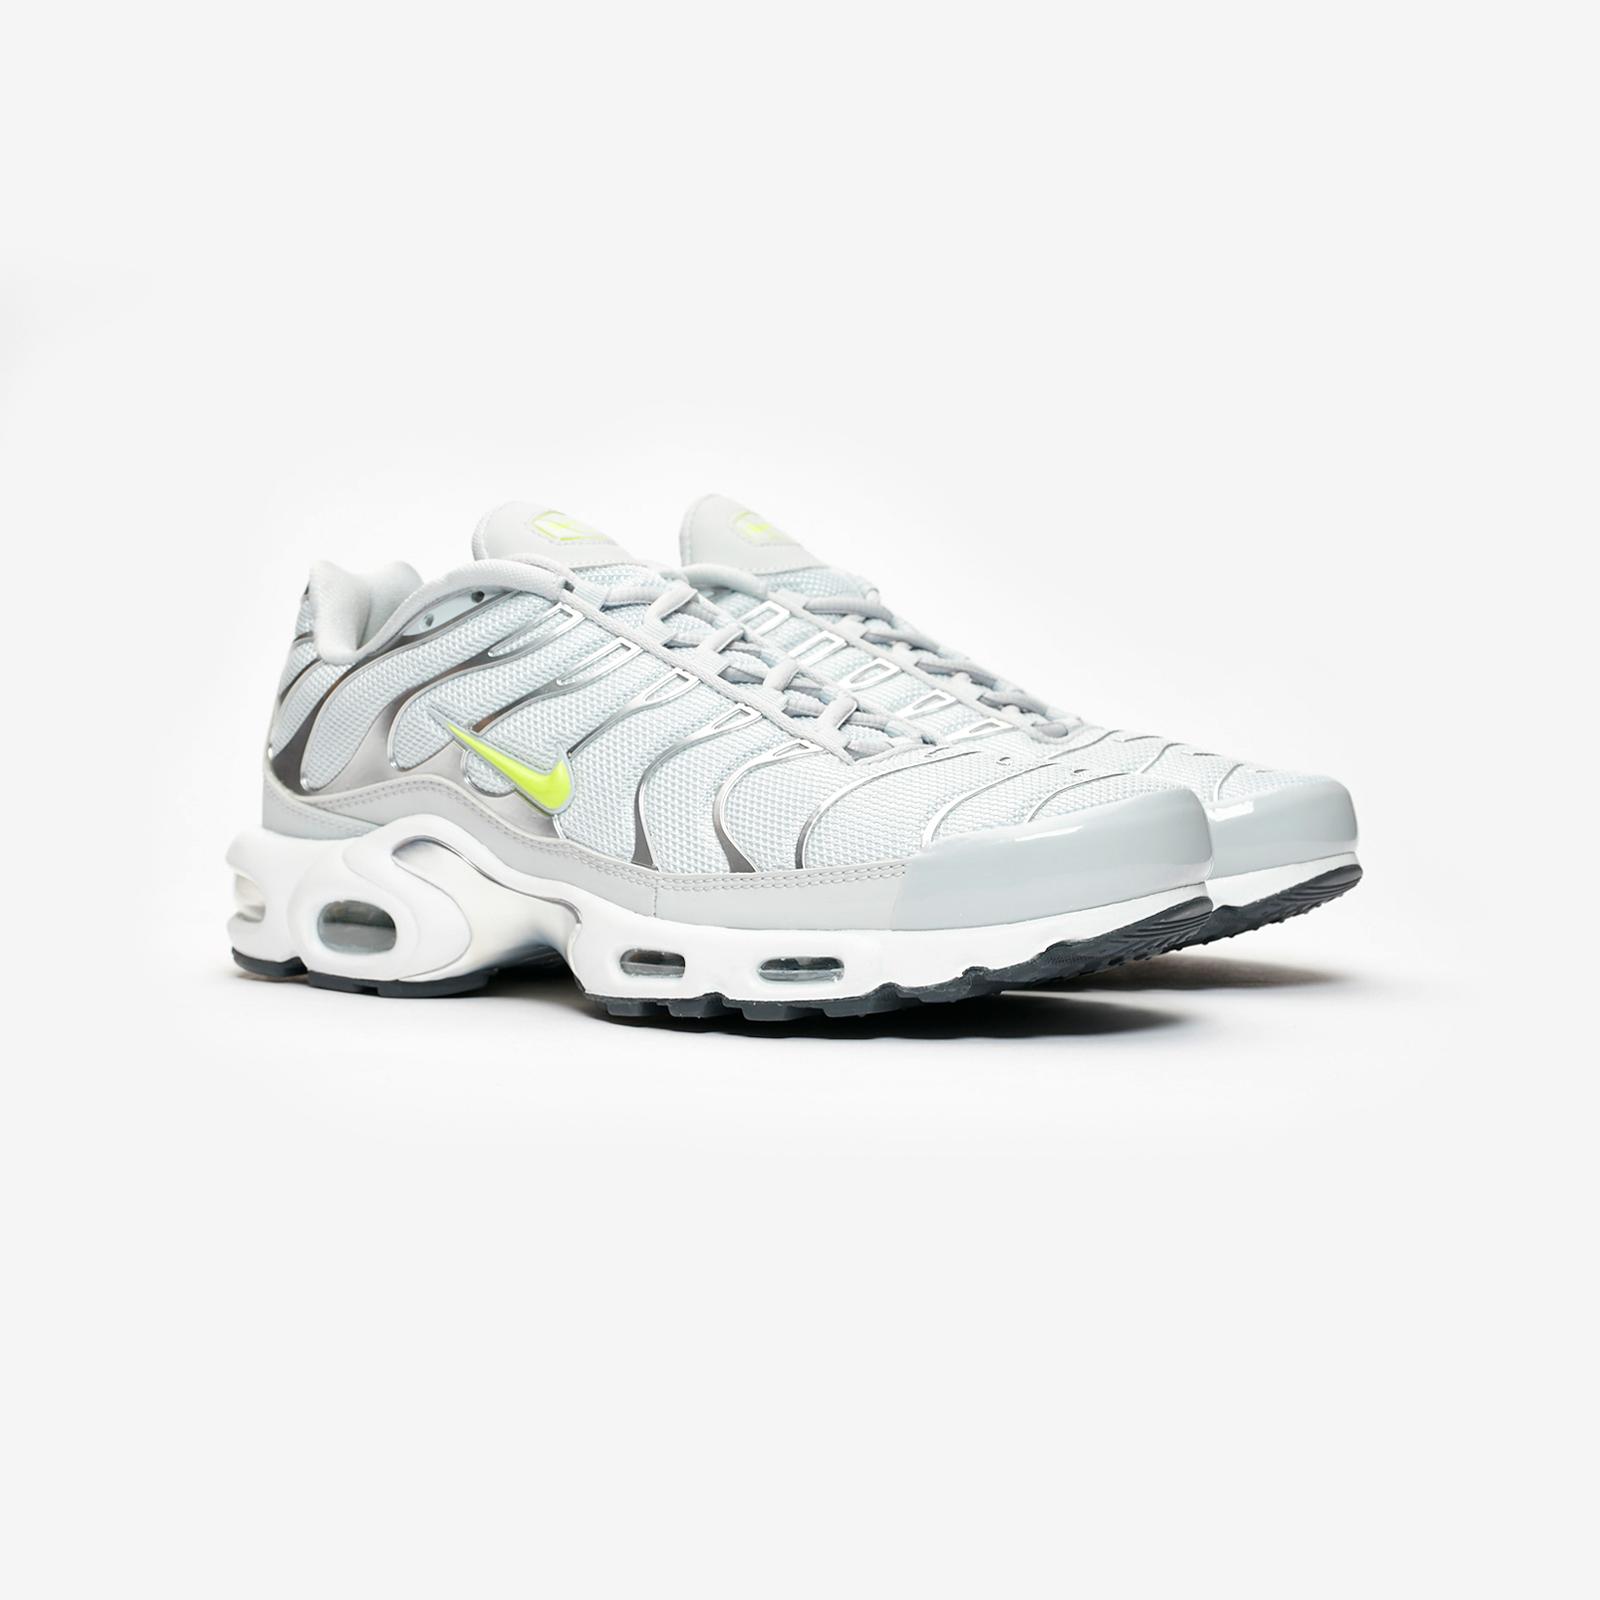 Nike Air Max Plus TN SE - Cd1533-002 - SNS | sneakers & streetwear ...